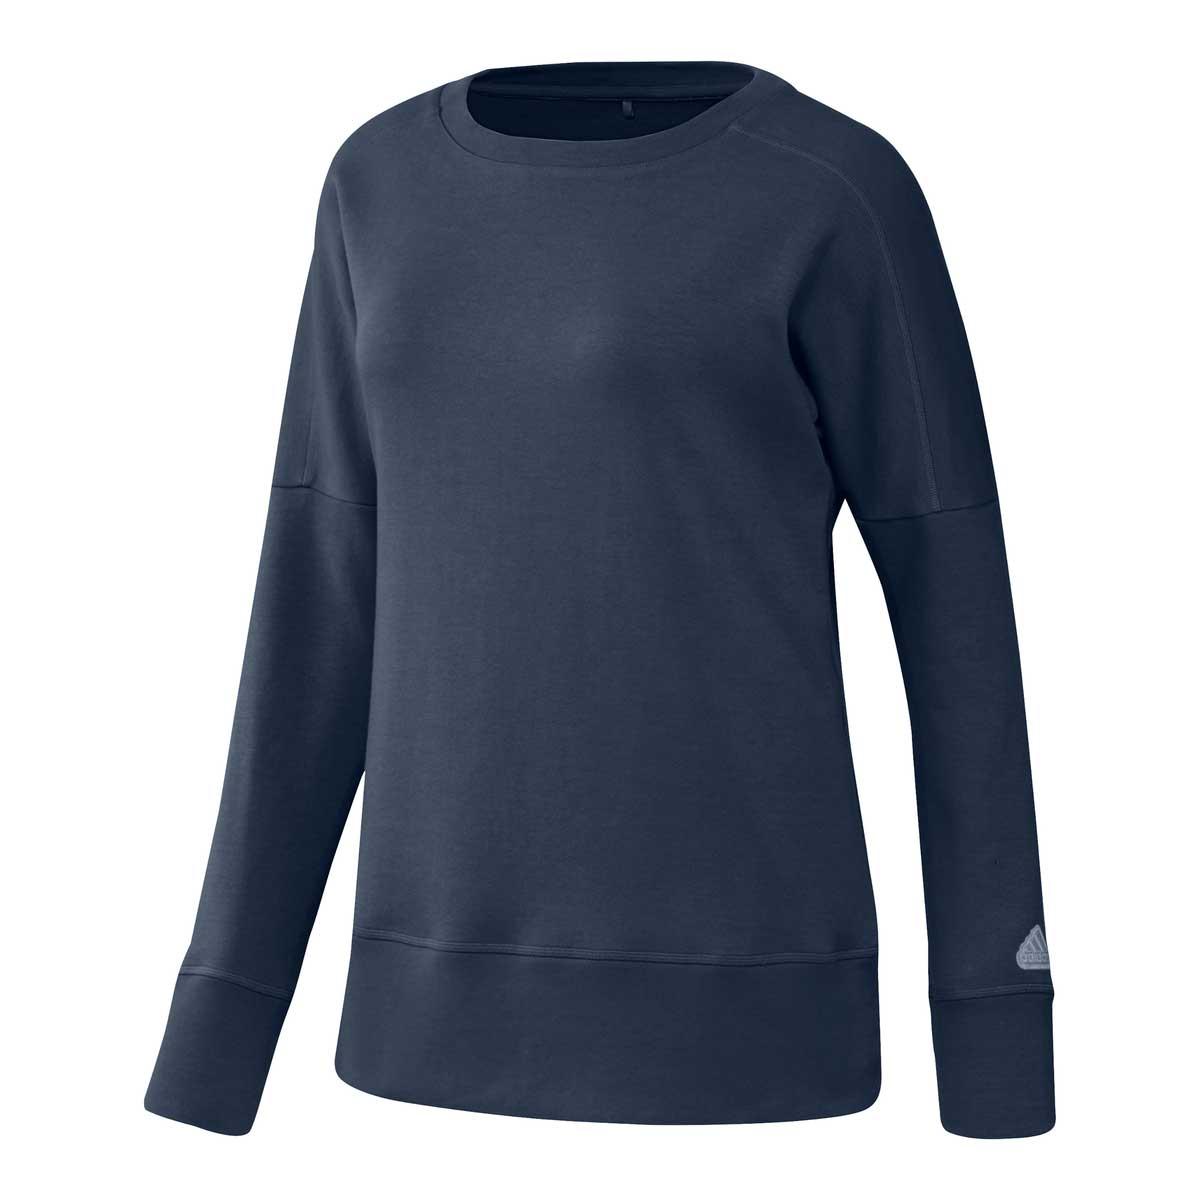 Adidas Women's Go-To Crew Navy Sweatshirt